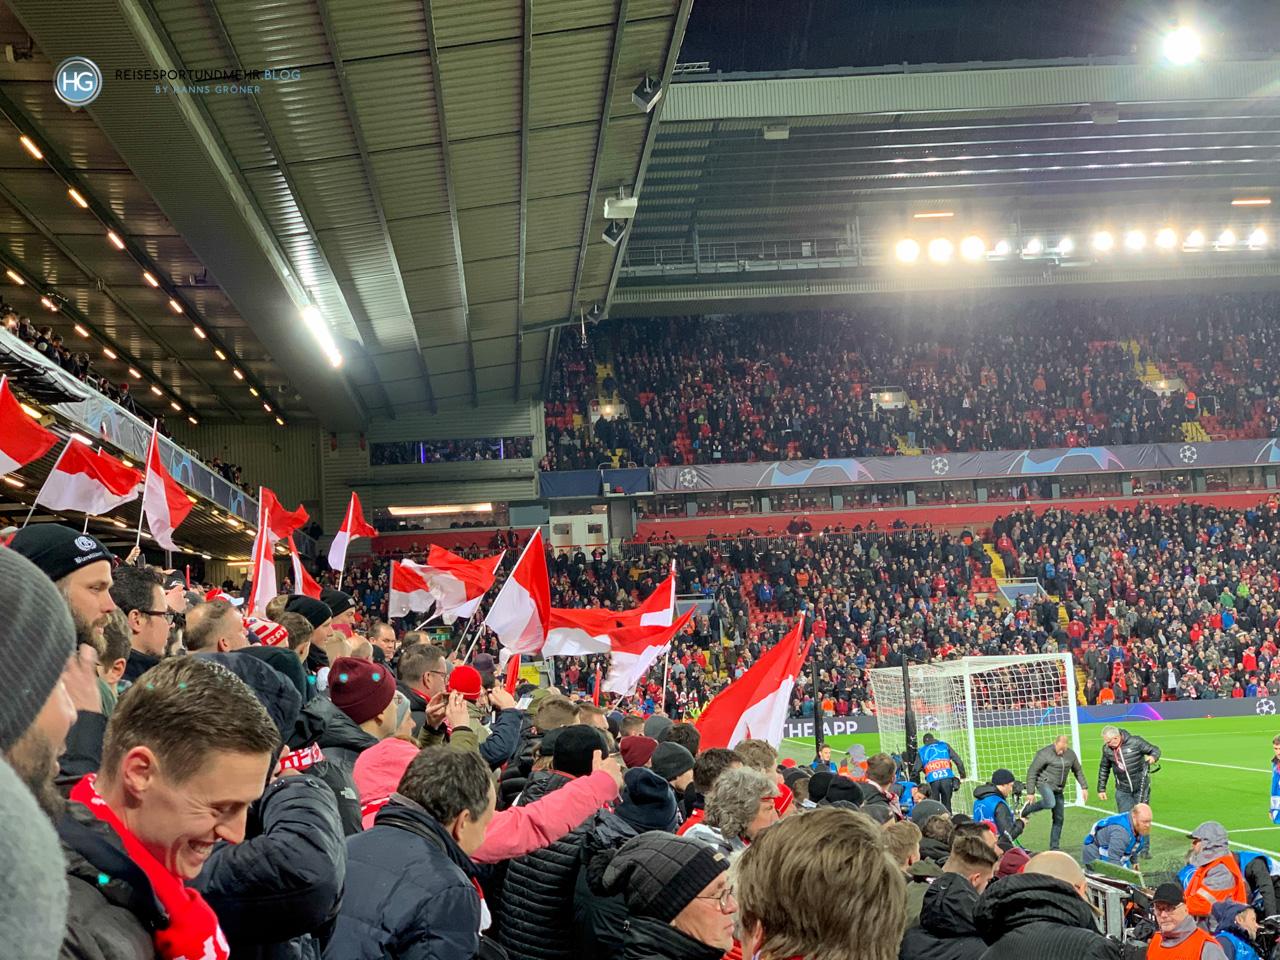 Liverpool-Bayern Februar 2019 - Foto: Hanns Gröner